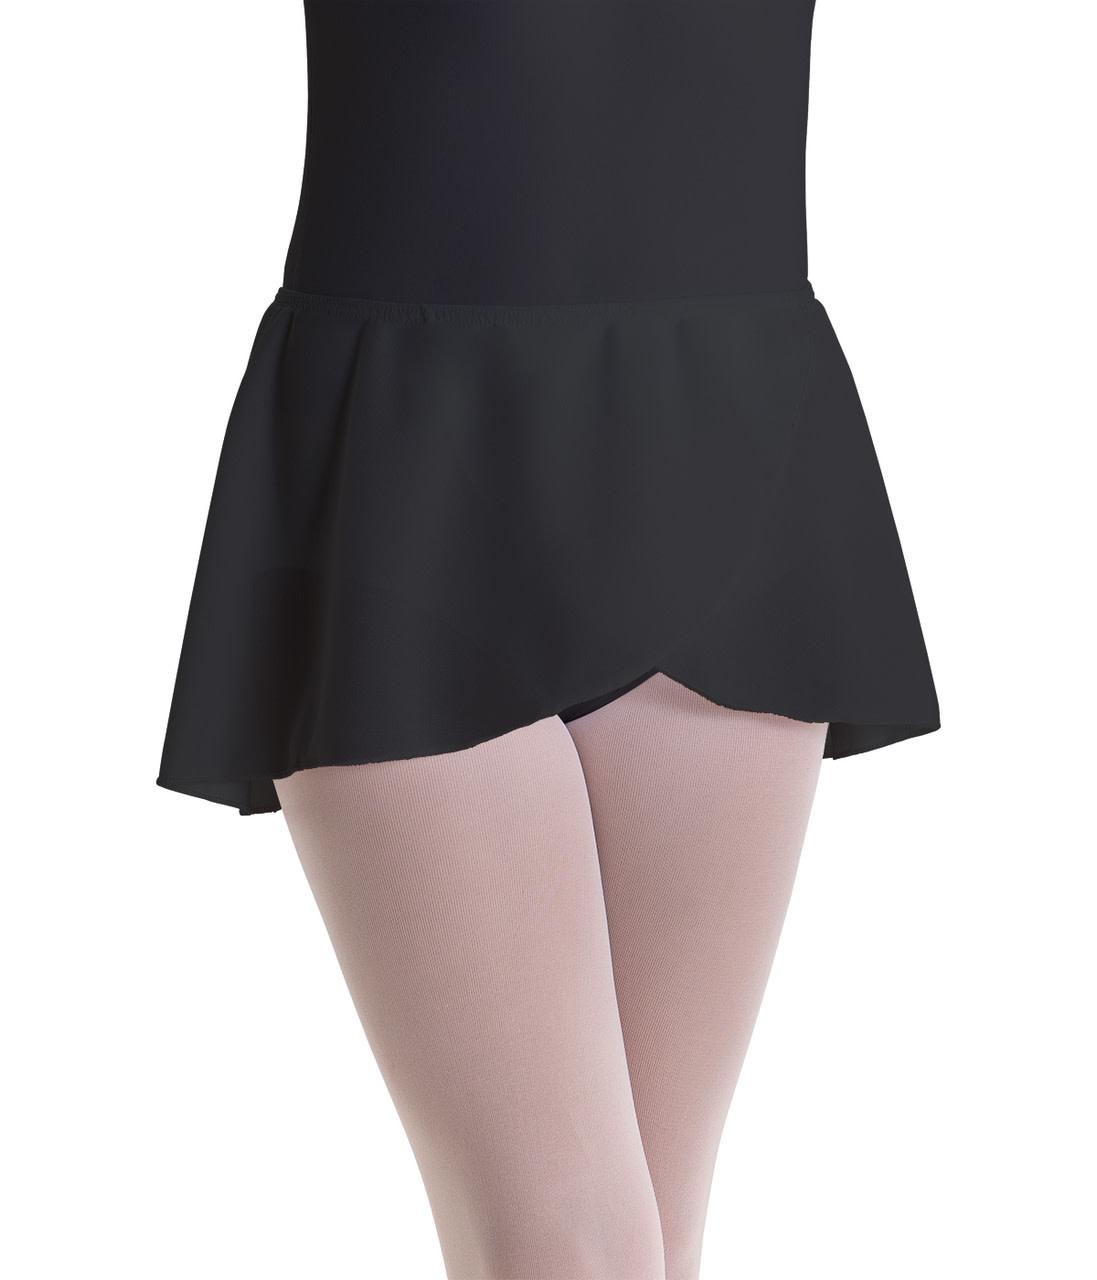 Motionwear Pull-On Skirt Motionwear 1028